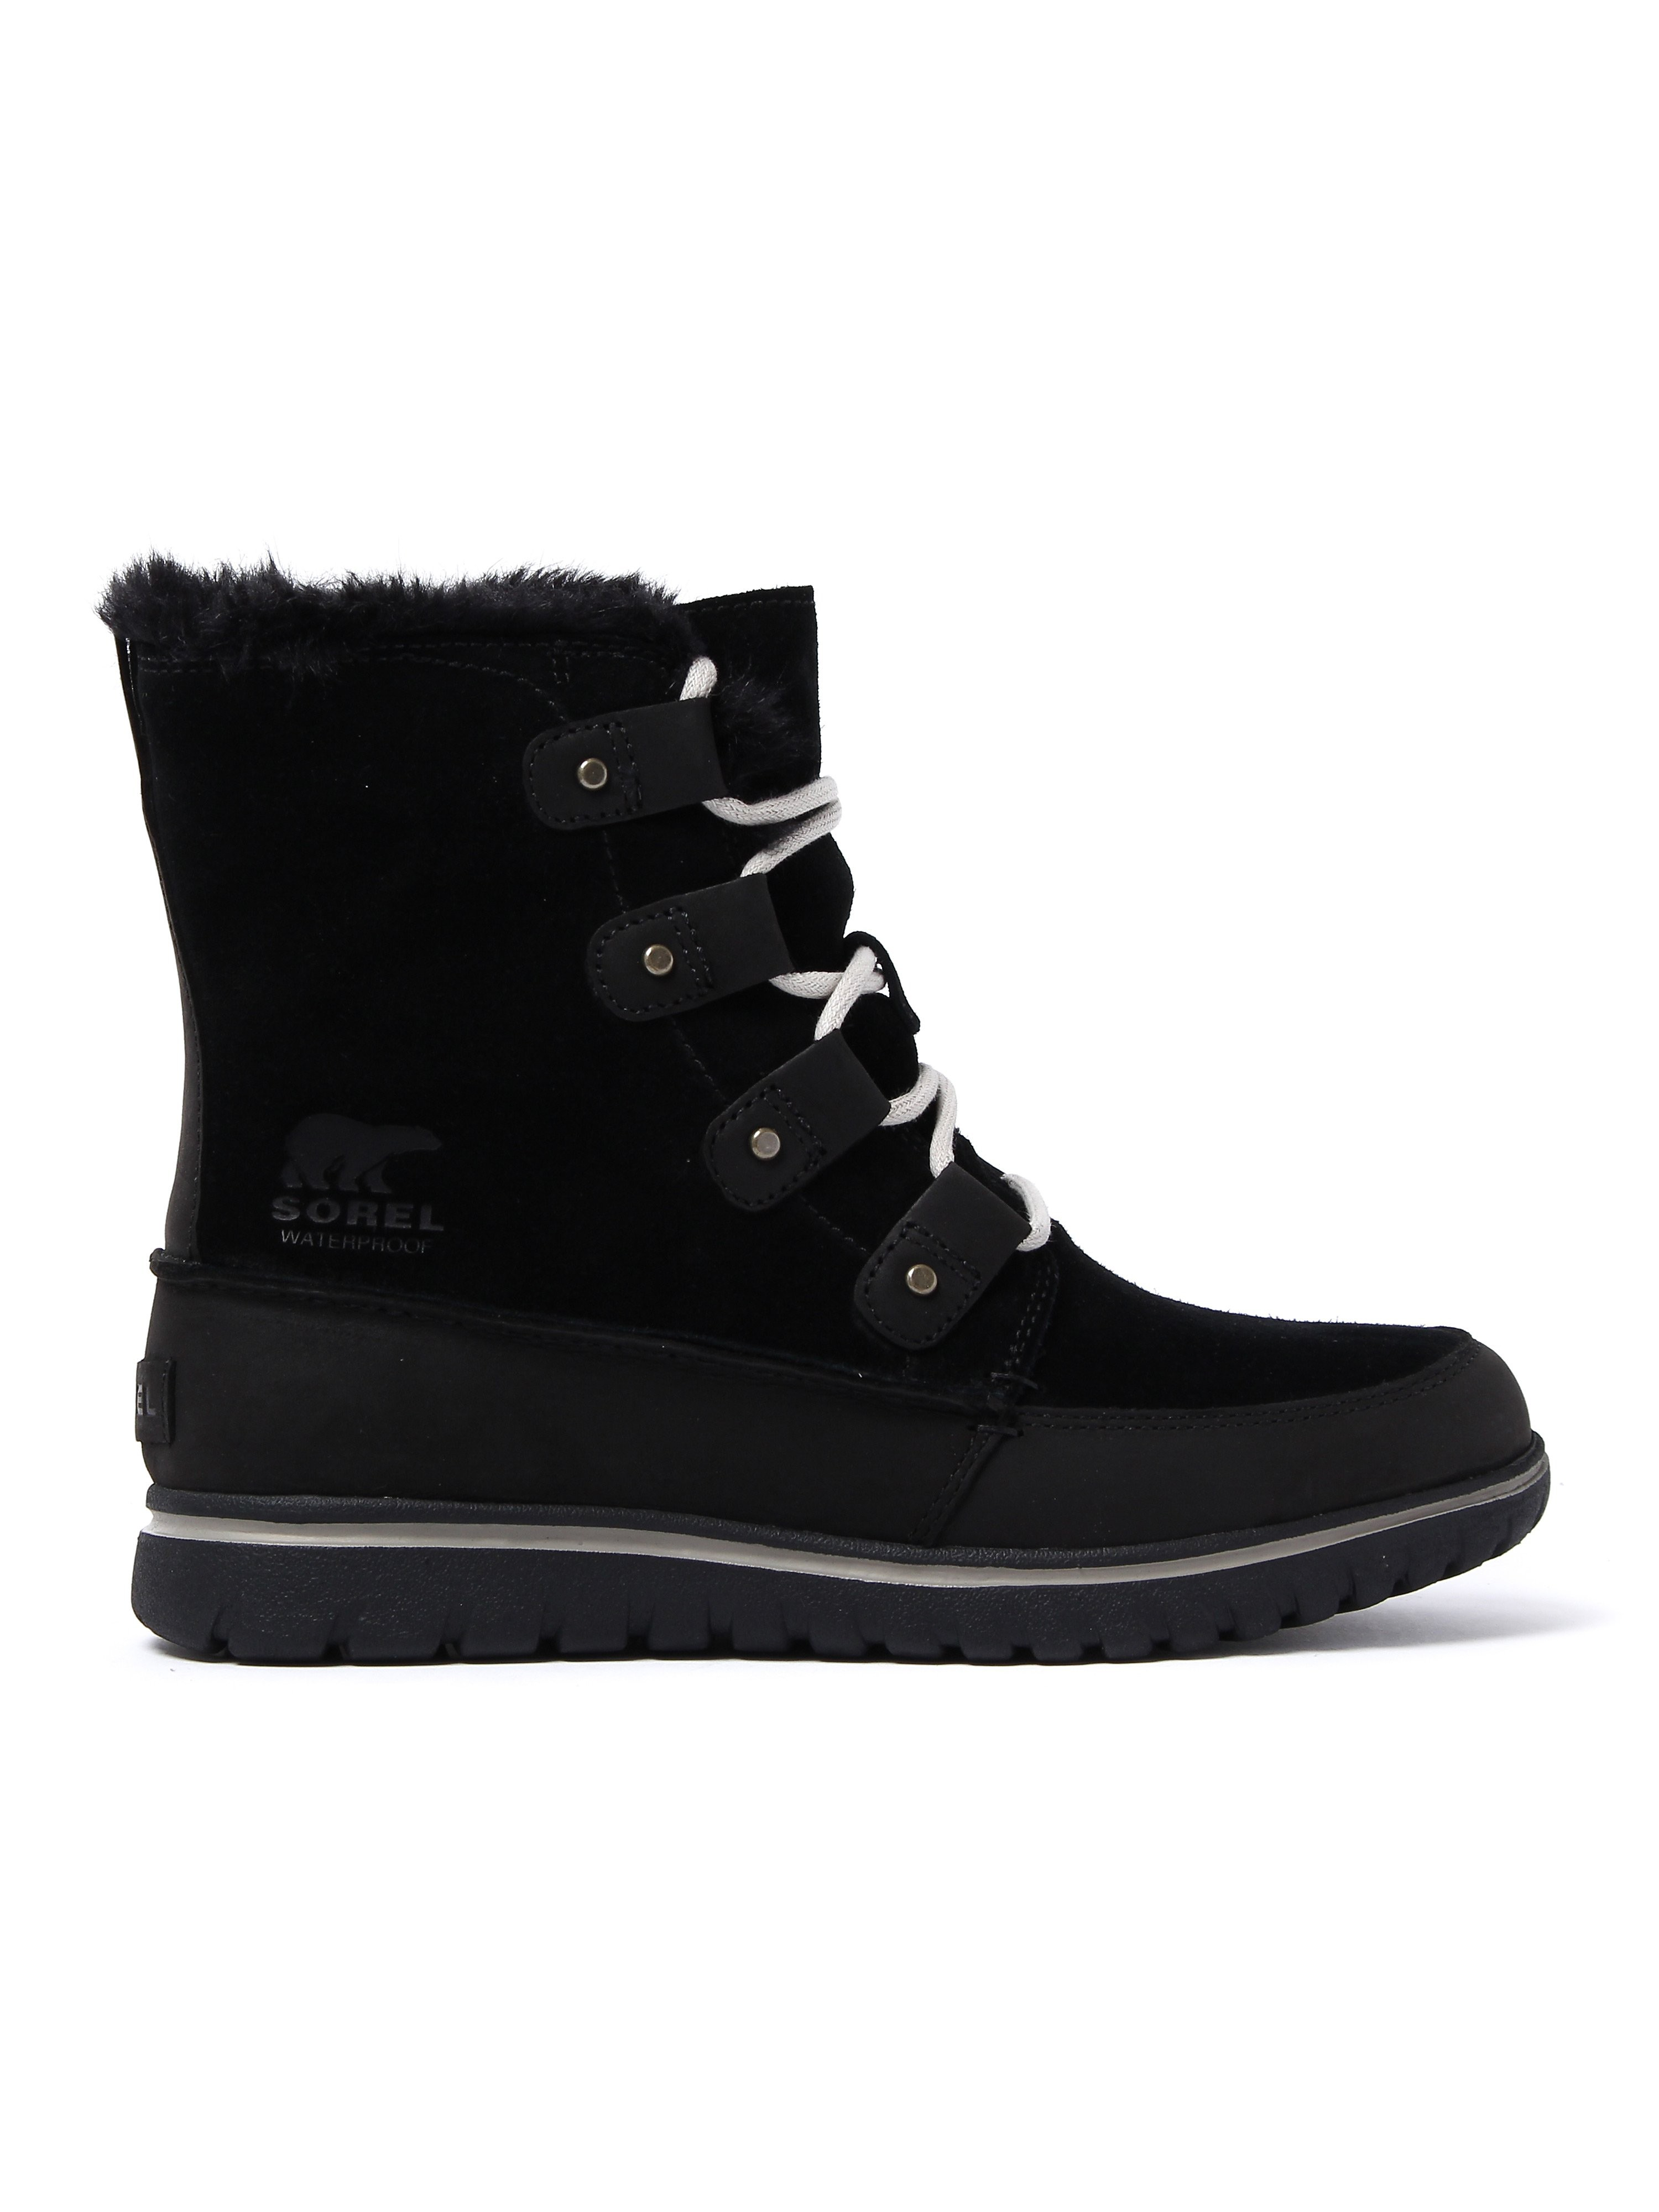 Sorel Women's Cosy Joan Boots - Black